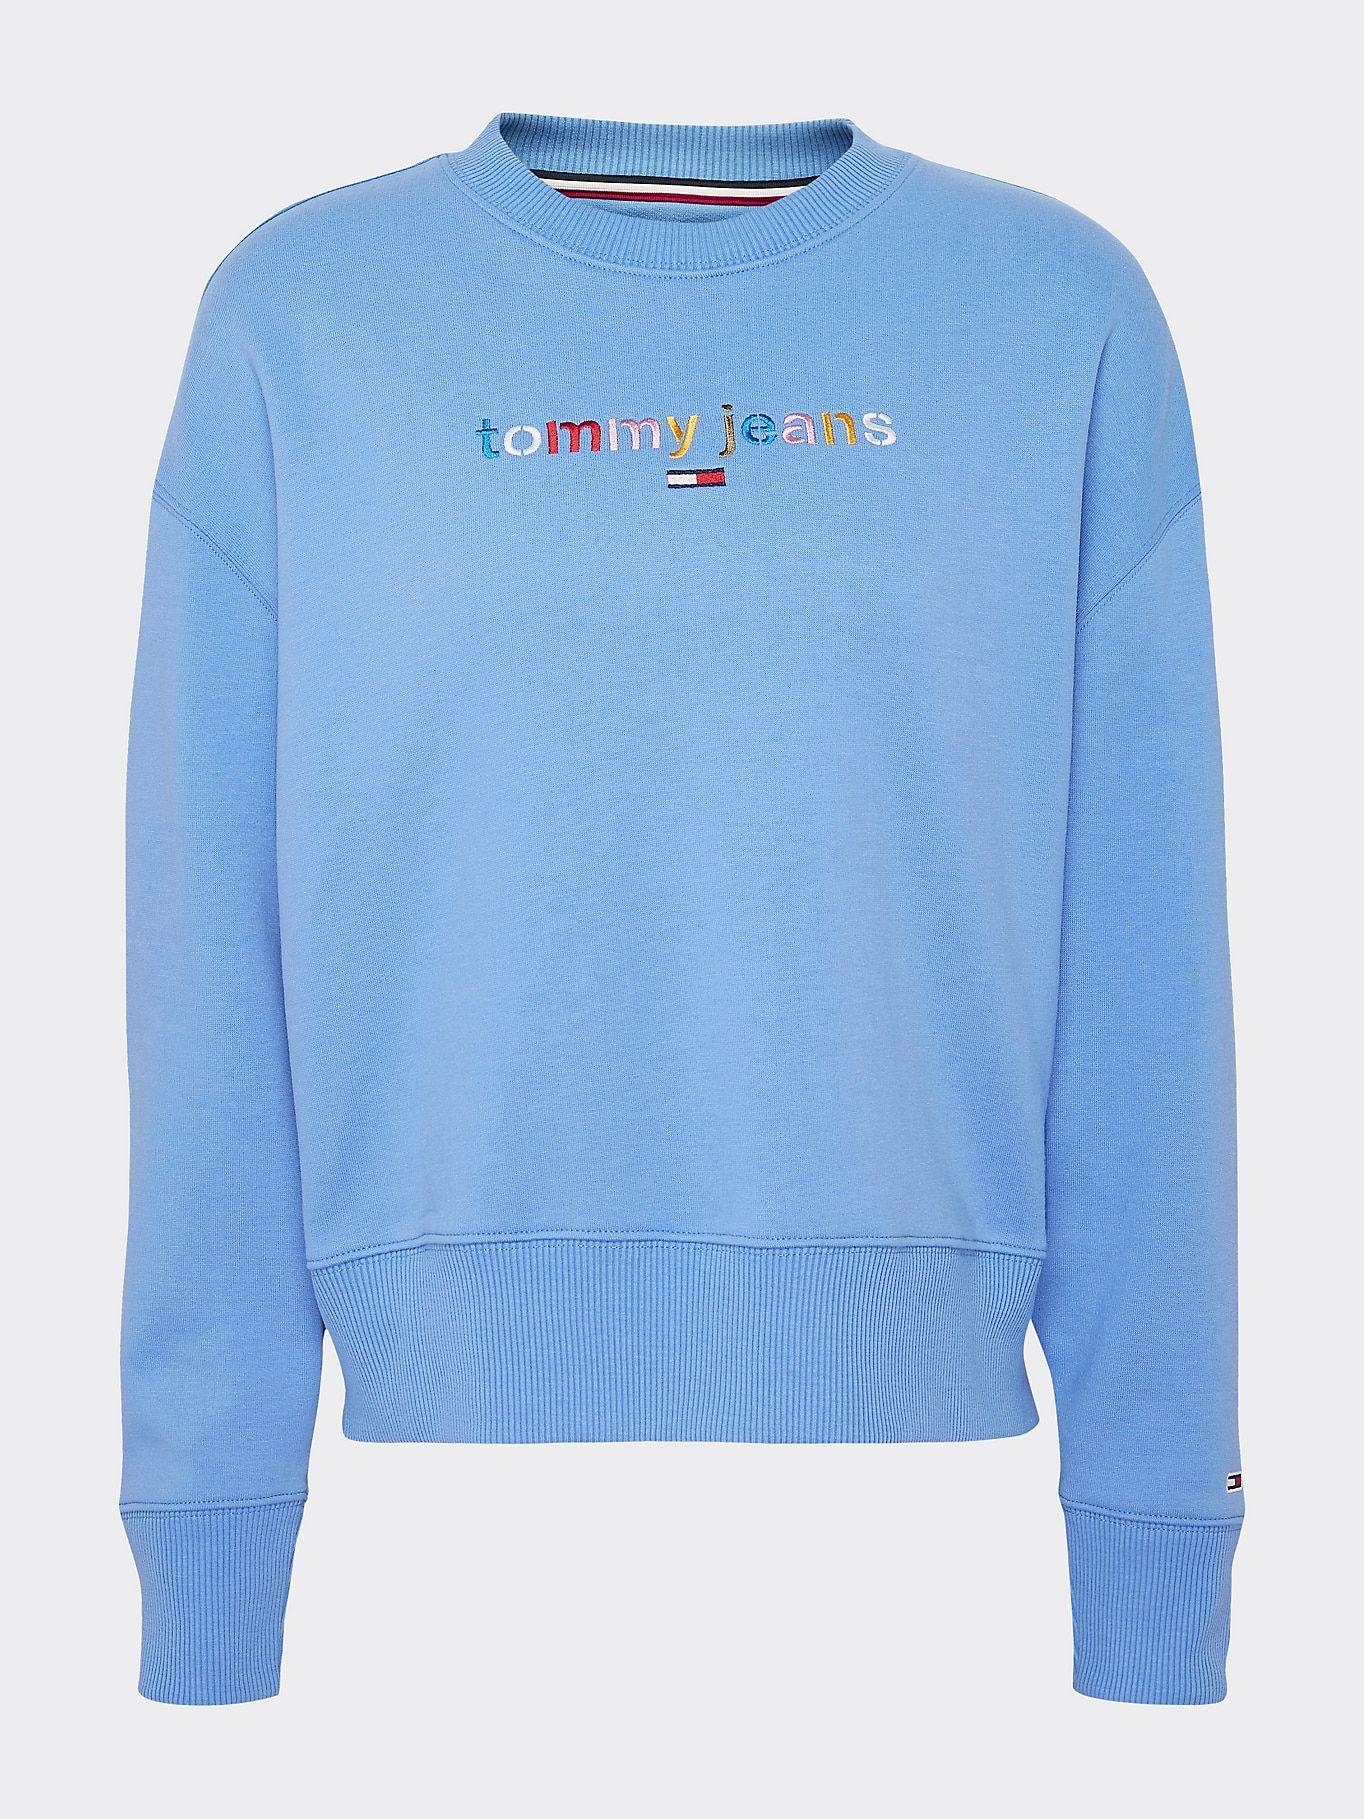 Multicolour Logo Relaxed Fit Sweatshirt Blue Tommy Hilfiger Workout Sweatshirt Sweatshirts Women Hoodies Sweatshirts [ 1819 x 1364 Pixel ]